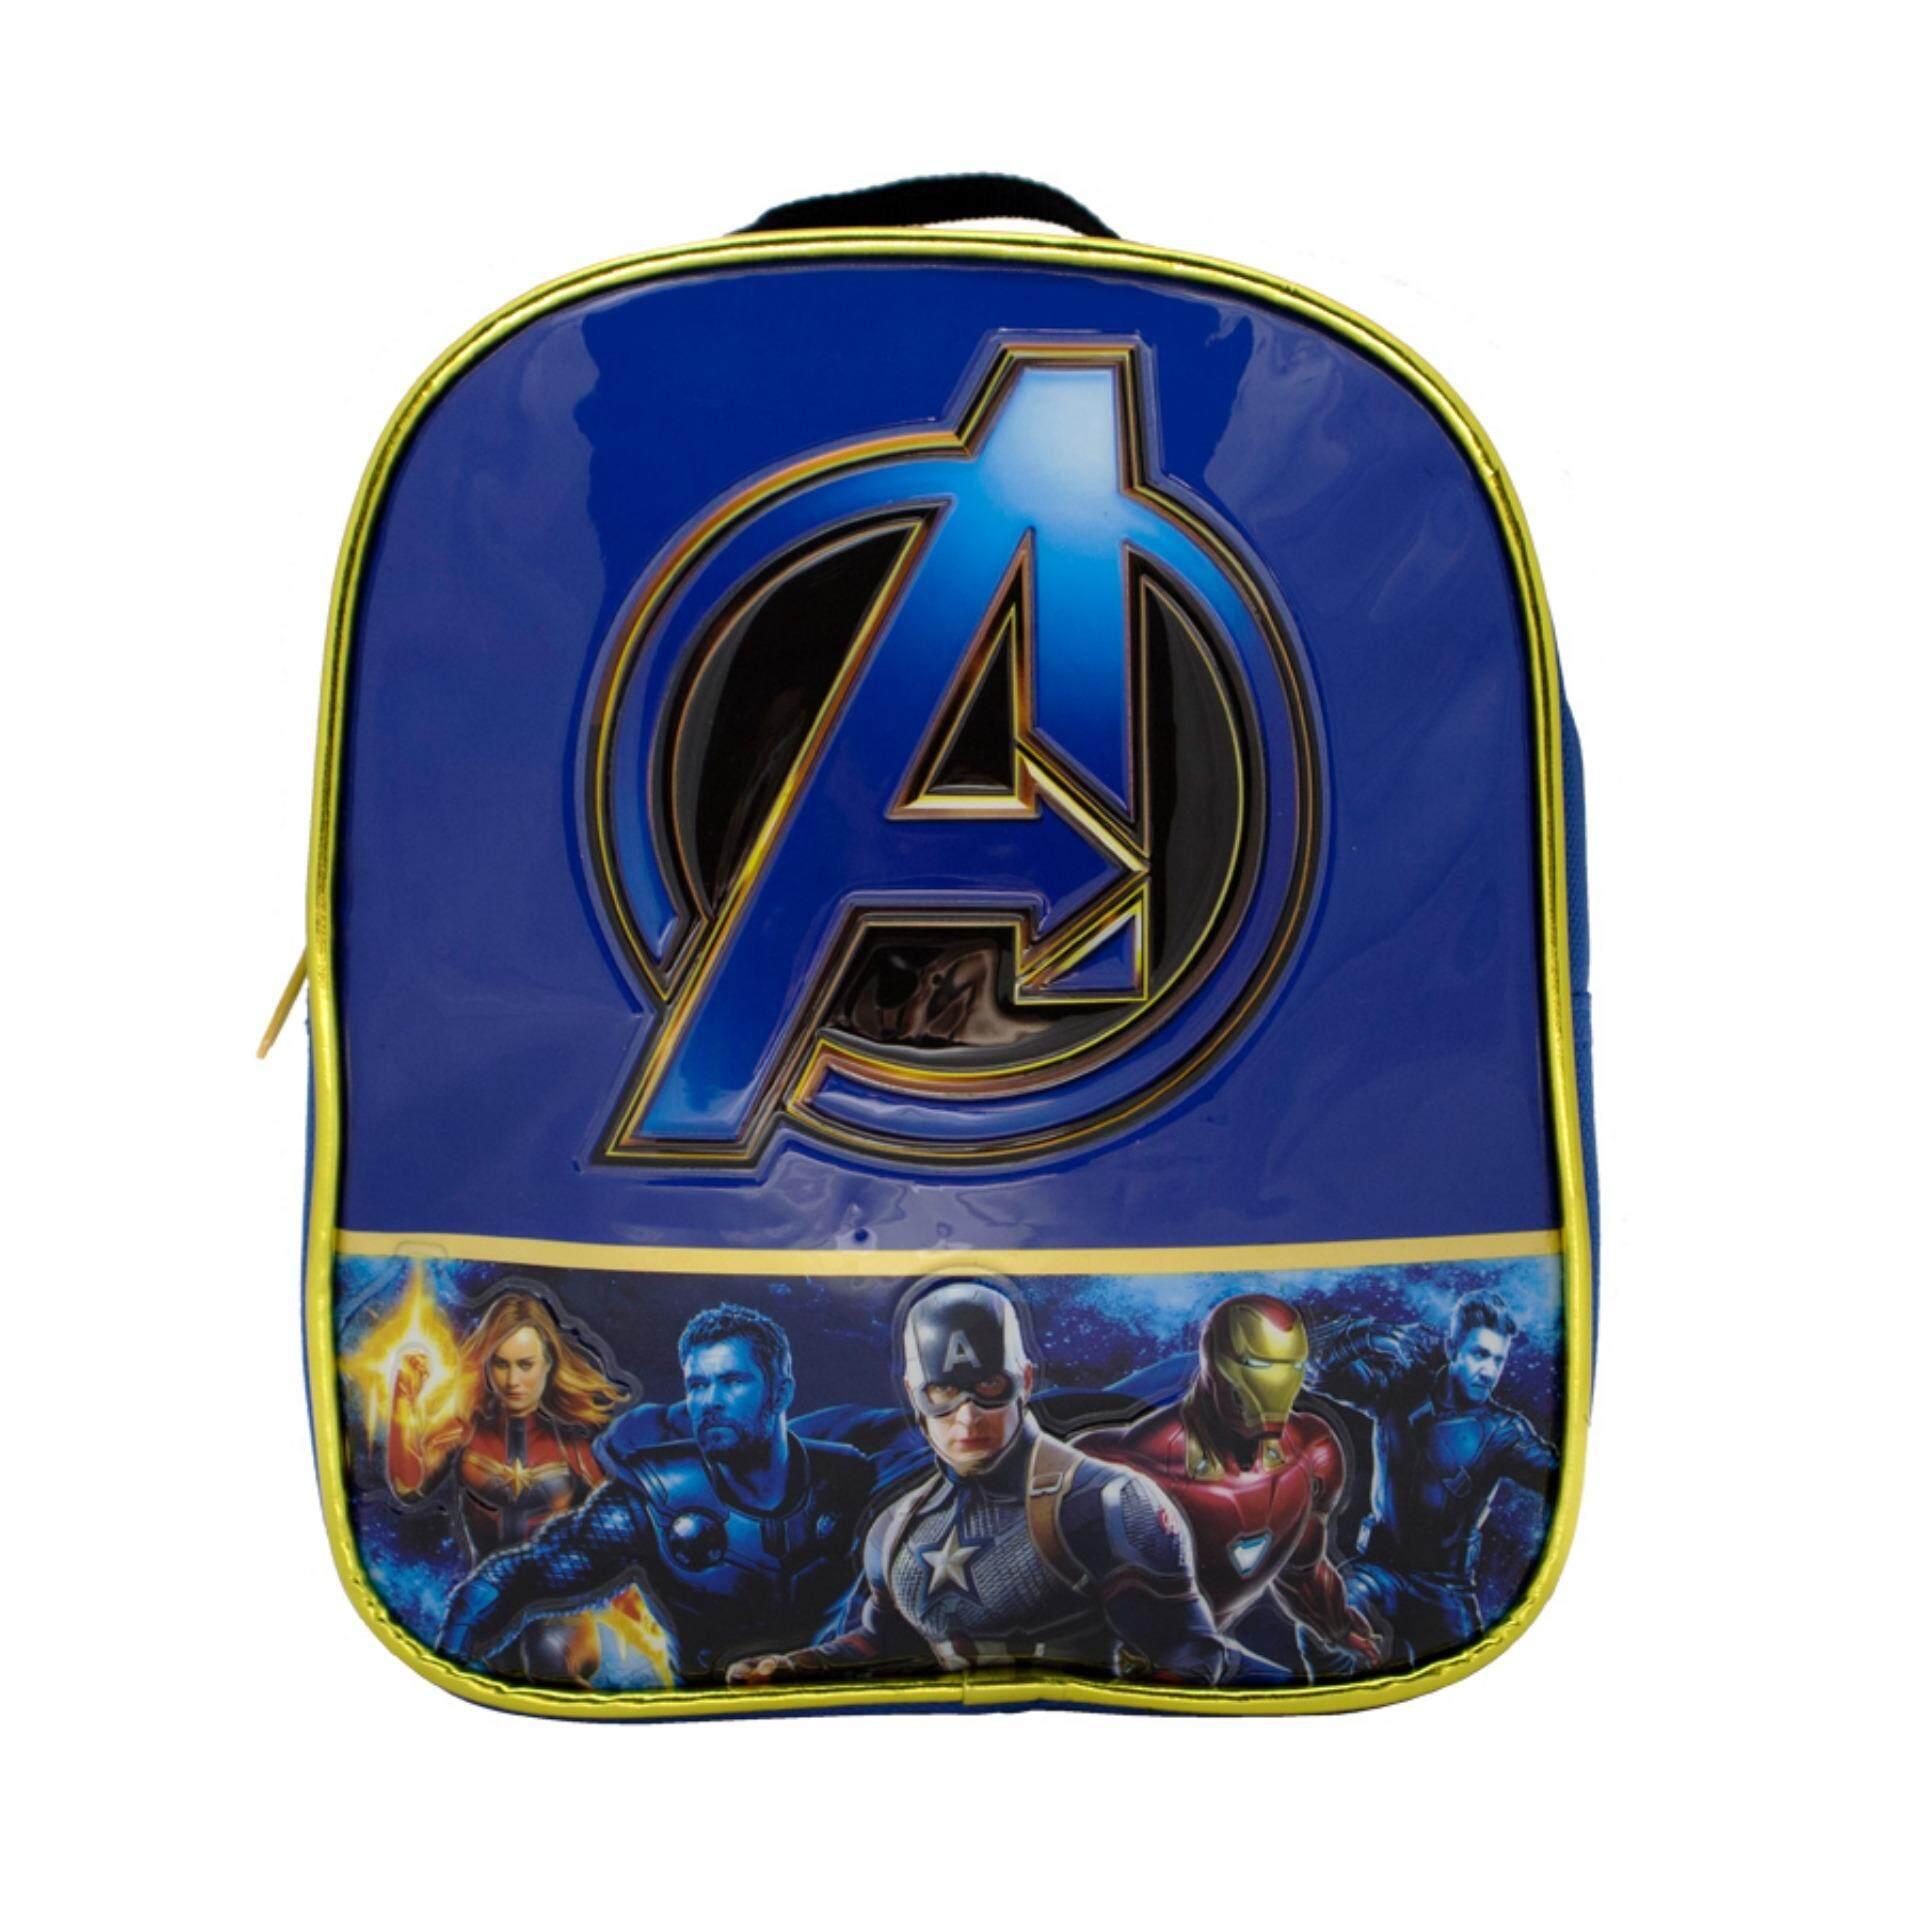 Marvel Avengers Endgame Pre School Kindergarten Nursery Kids Children Water Resistant Lightweight 9 Inches Sling Backpack - Blue Colour